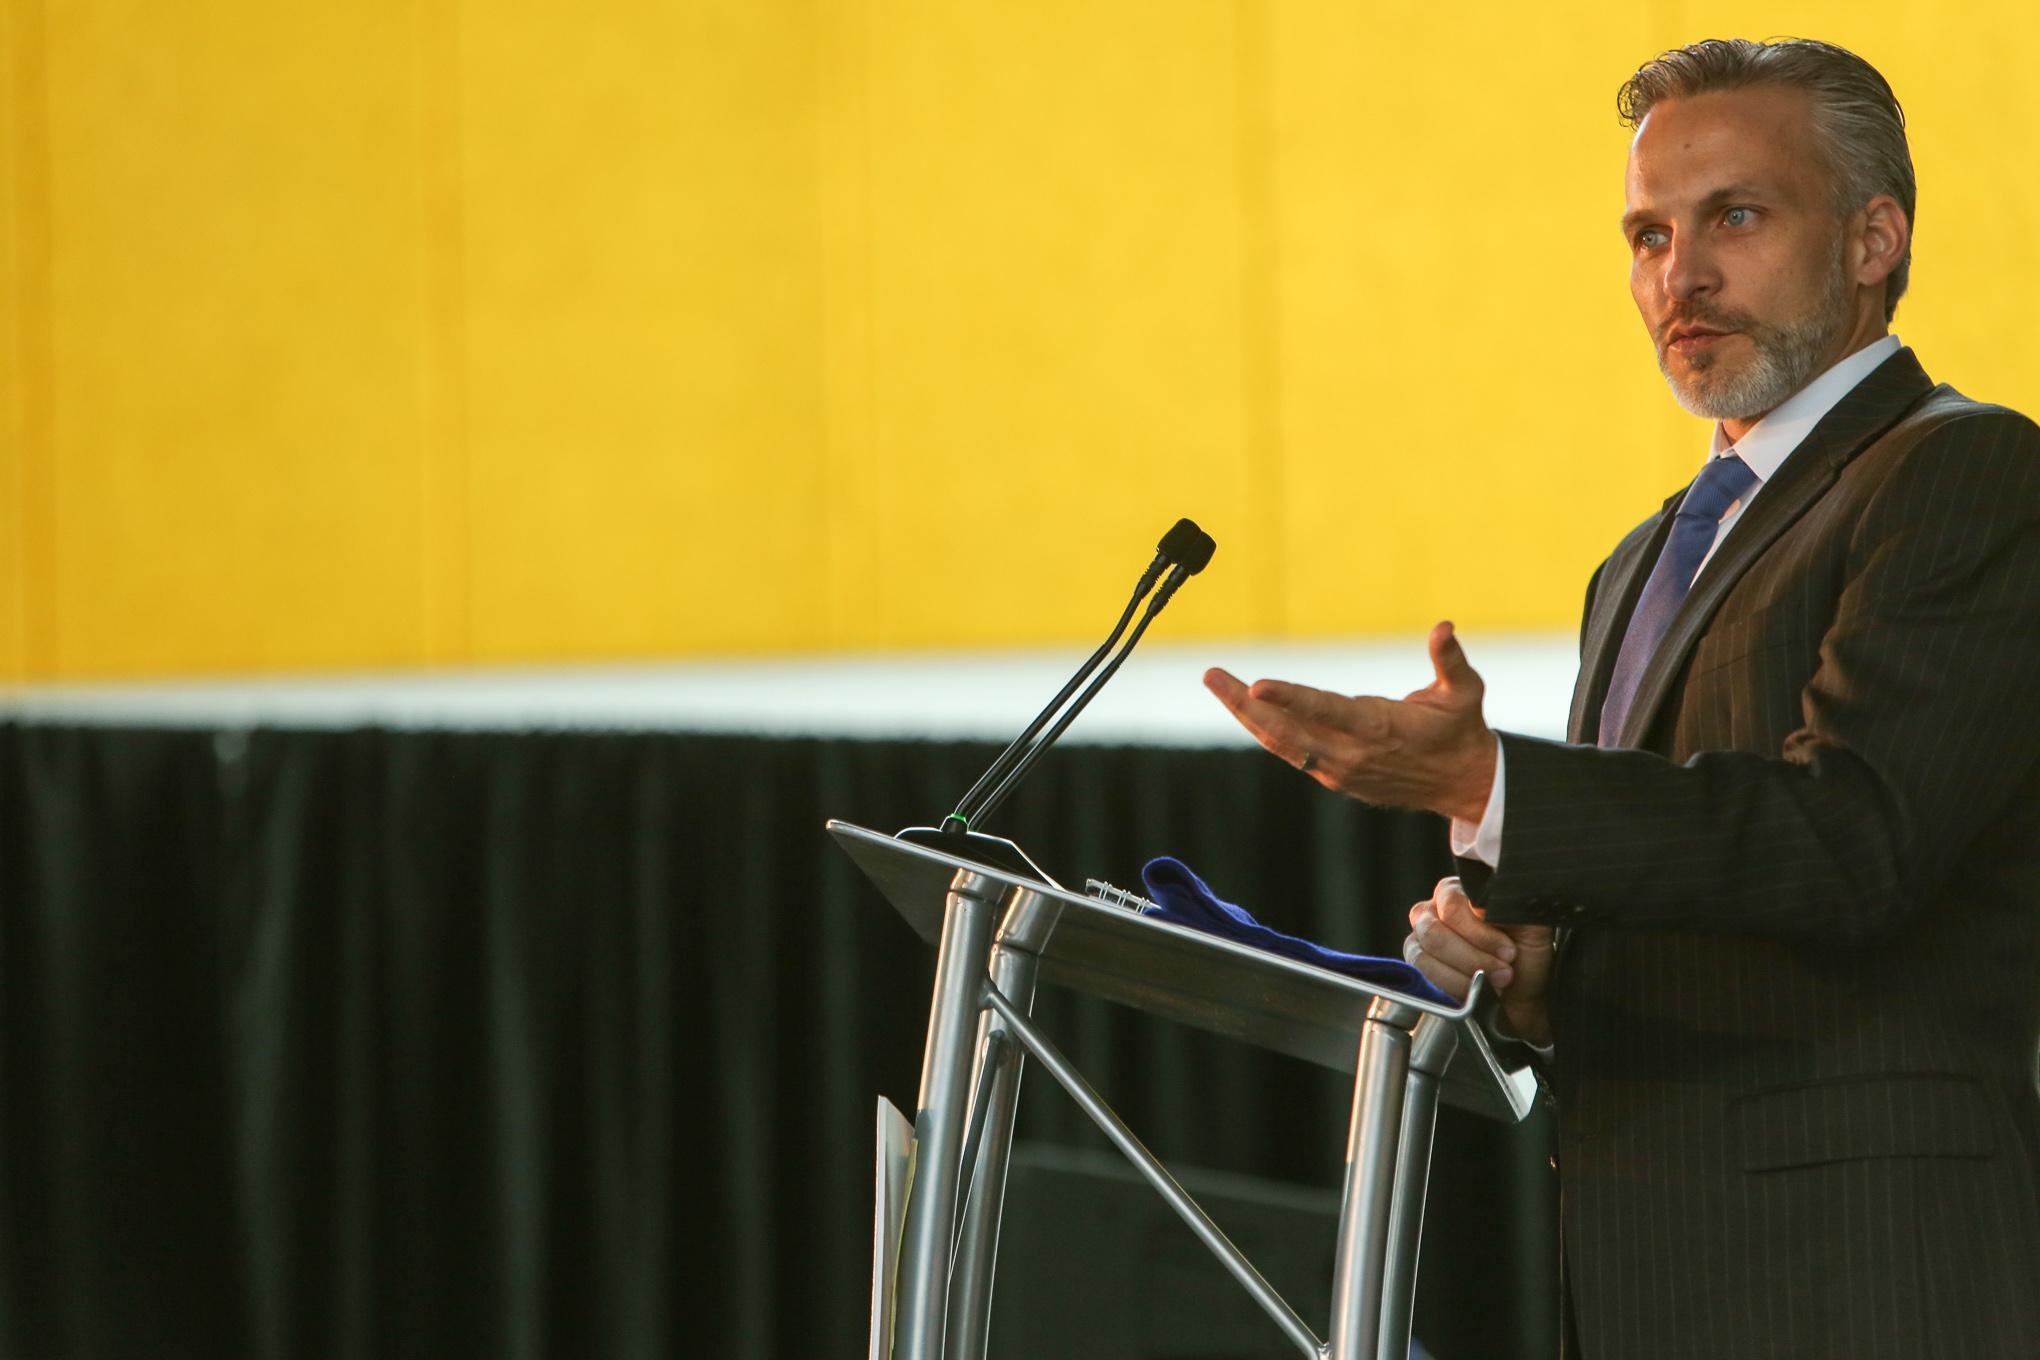 KIPP: San Antonio CEO Mark Larson recollects the beginnings of his pathway into KIPP. Photo by Scott Ball.